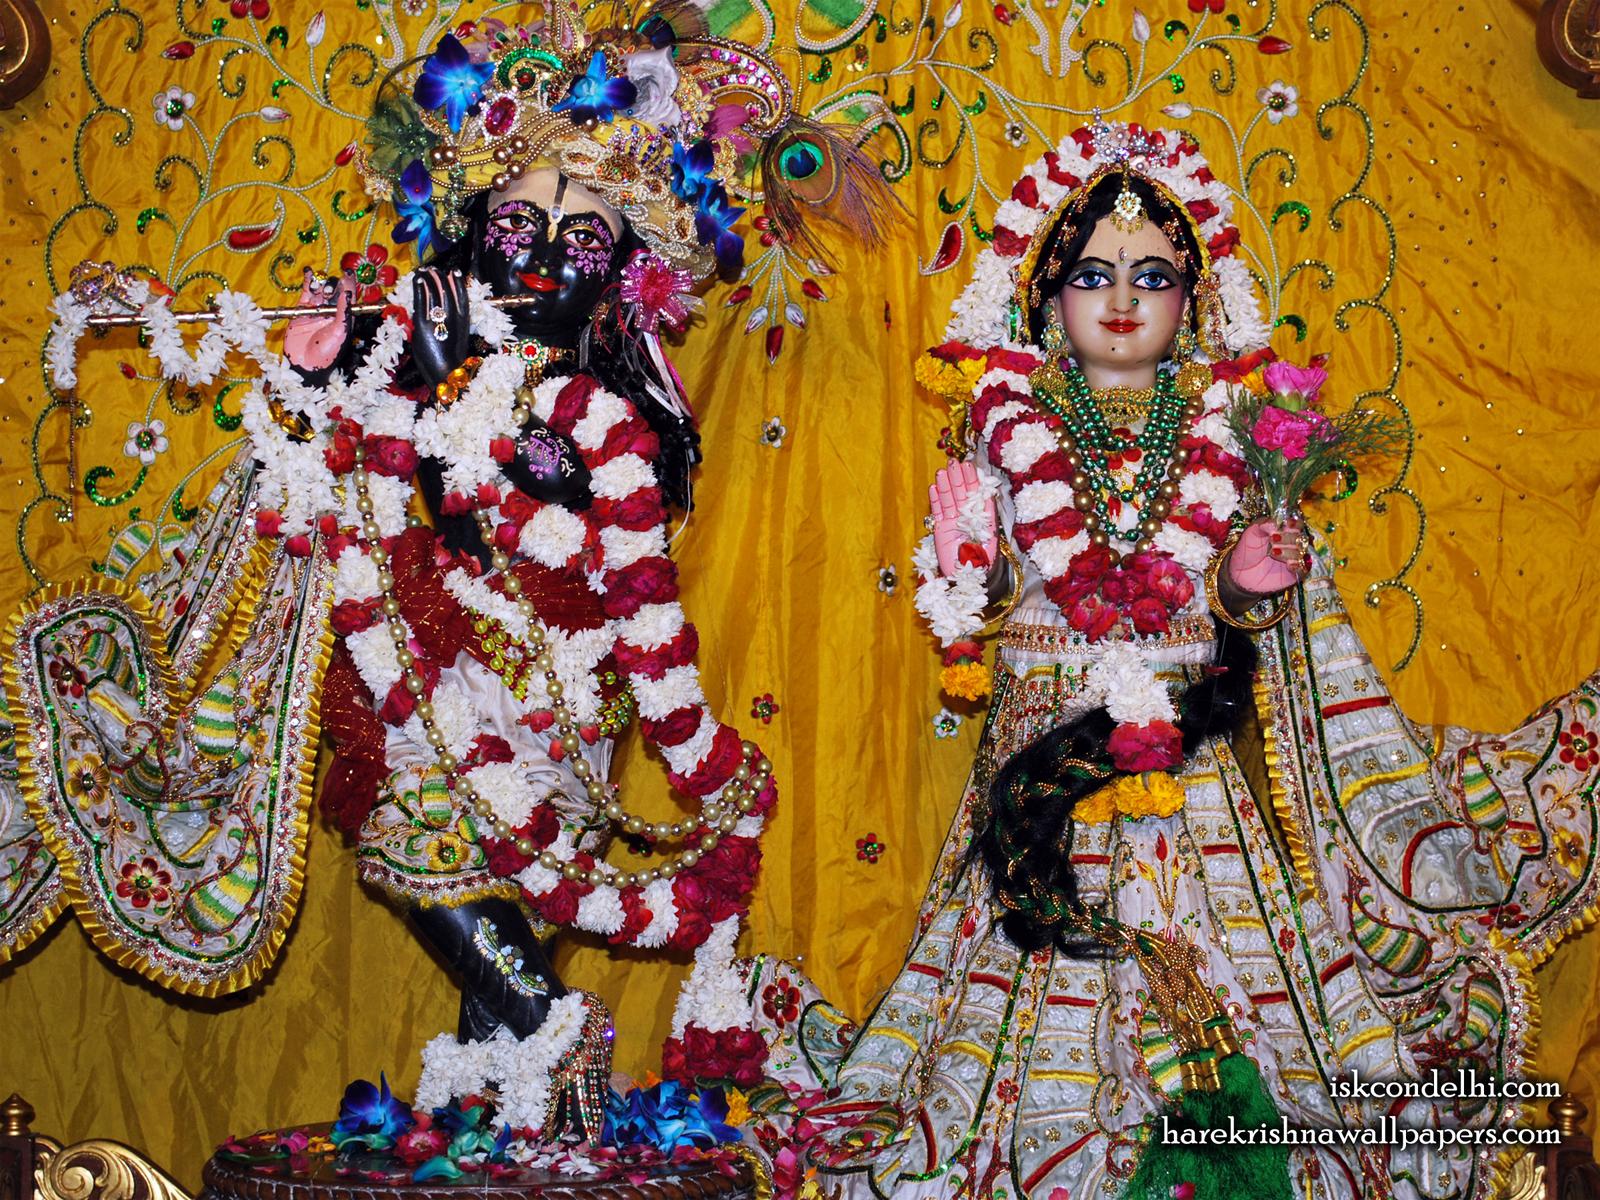 Sri Sri Radha Parthasarathi Wallpaper (010) Size1600x1200 Download